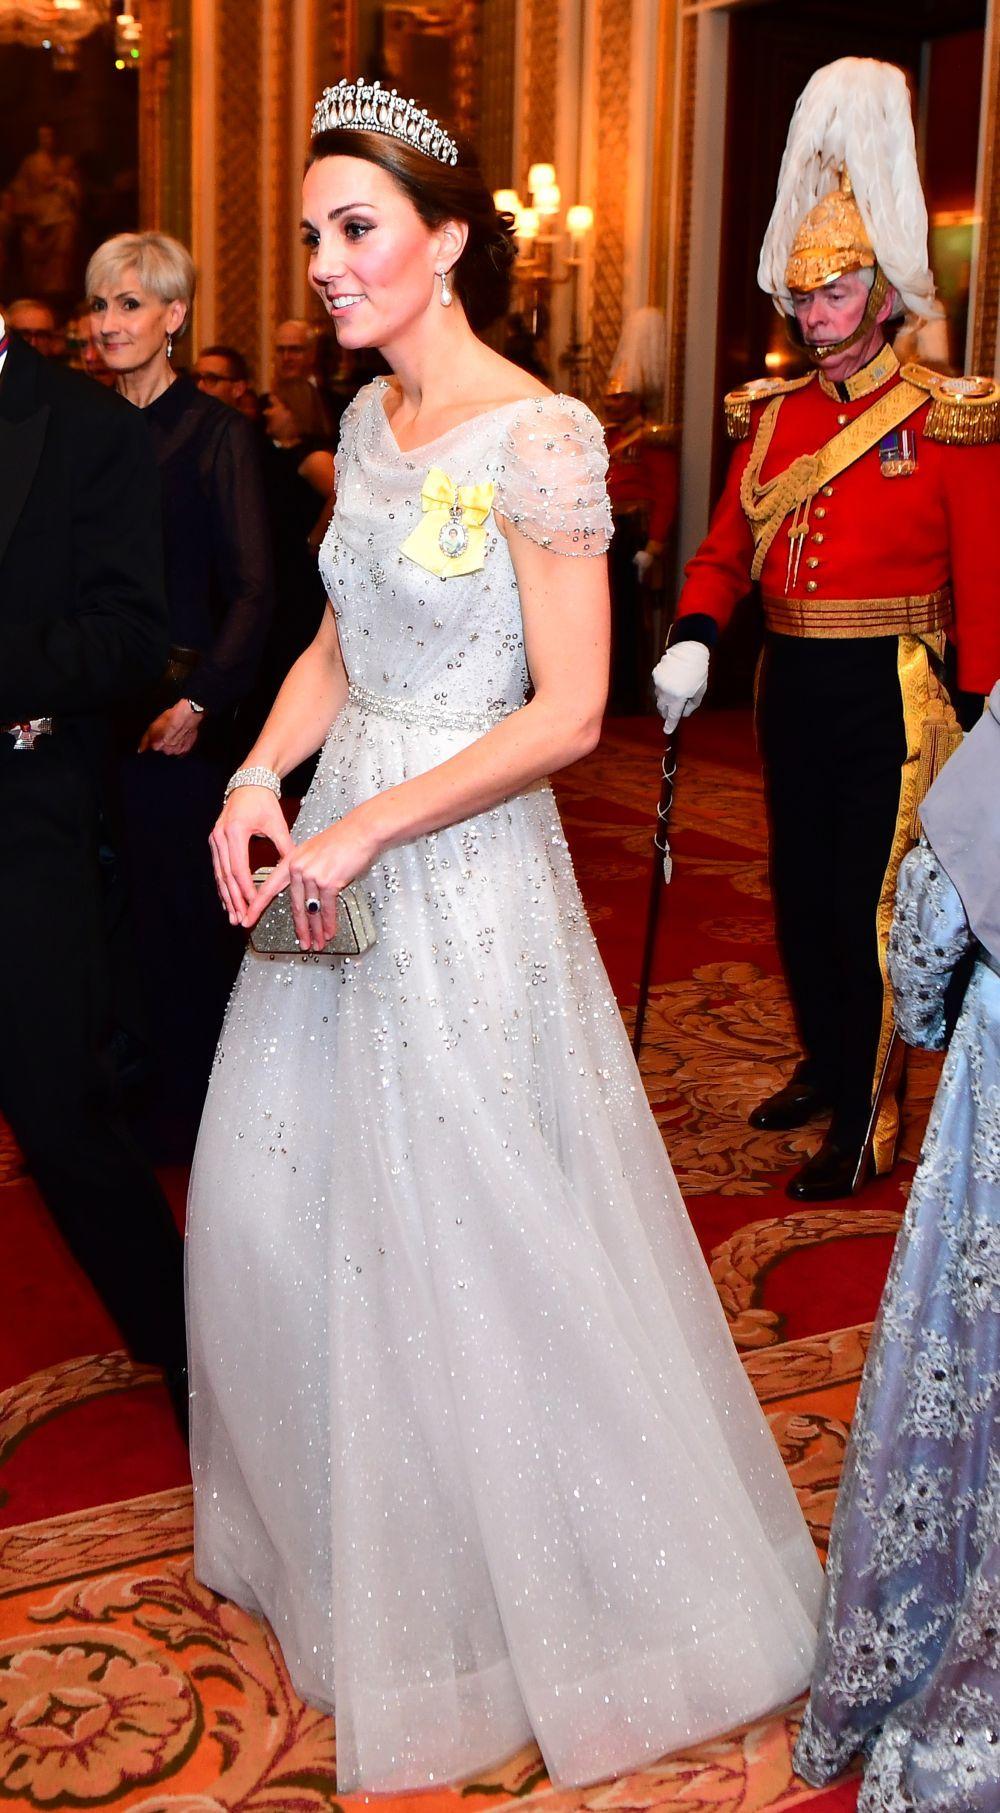 Este vestido es un diseño de Jenny Packham